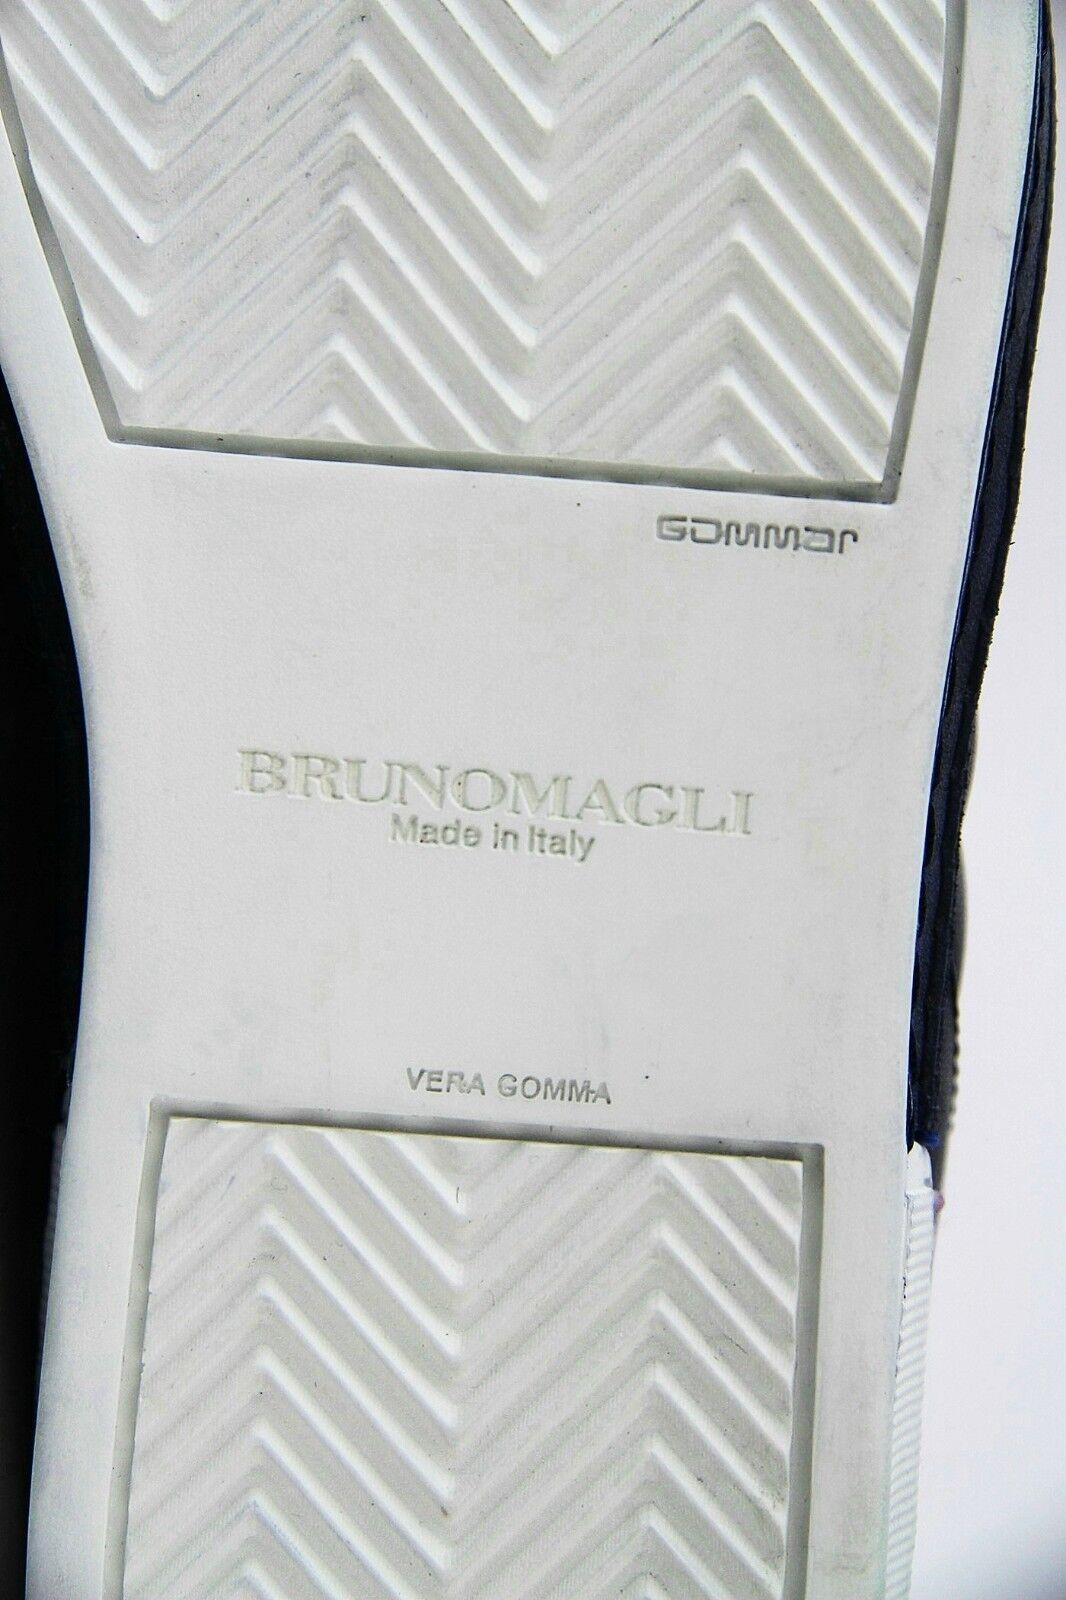 BRUNO MAGLI BLUE BLUE BLUE SANTO SHOES SNEAKER 100% CALF LEATHER ITALY NEW ORIGINAL BOX aae16c